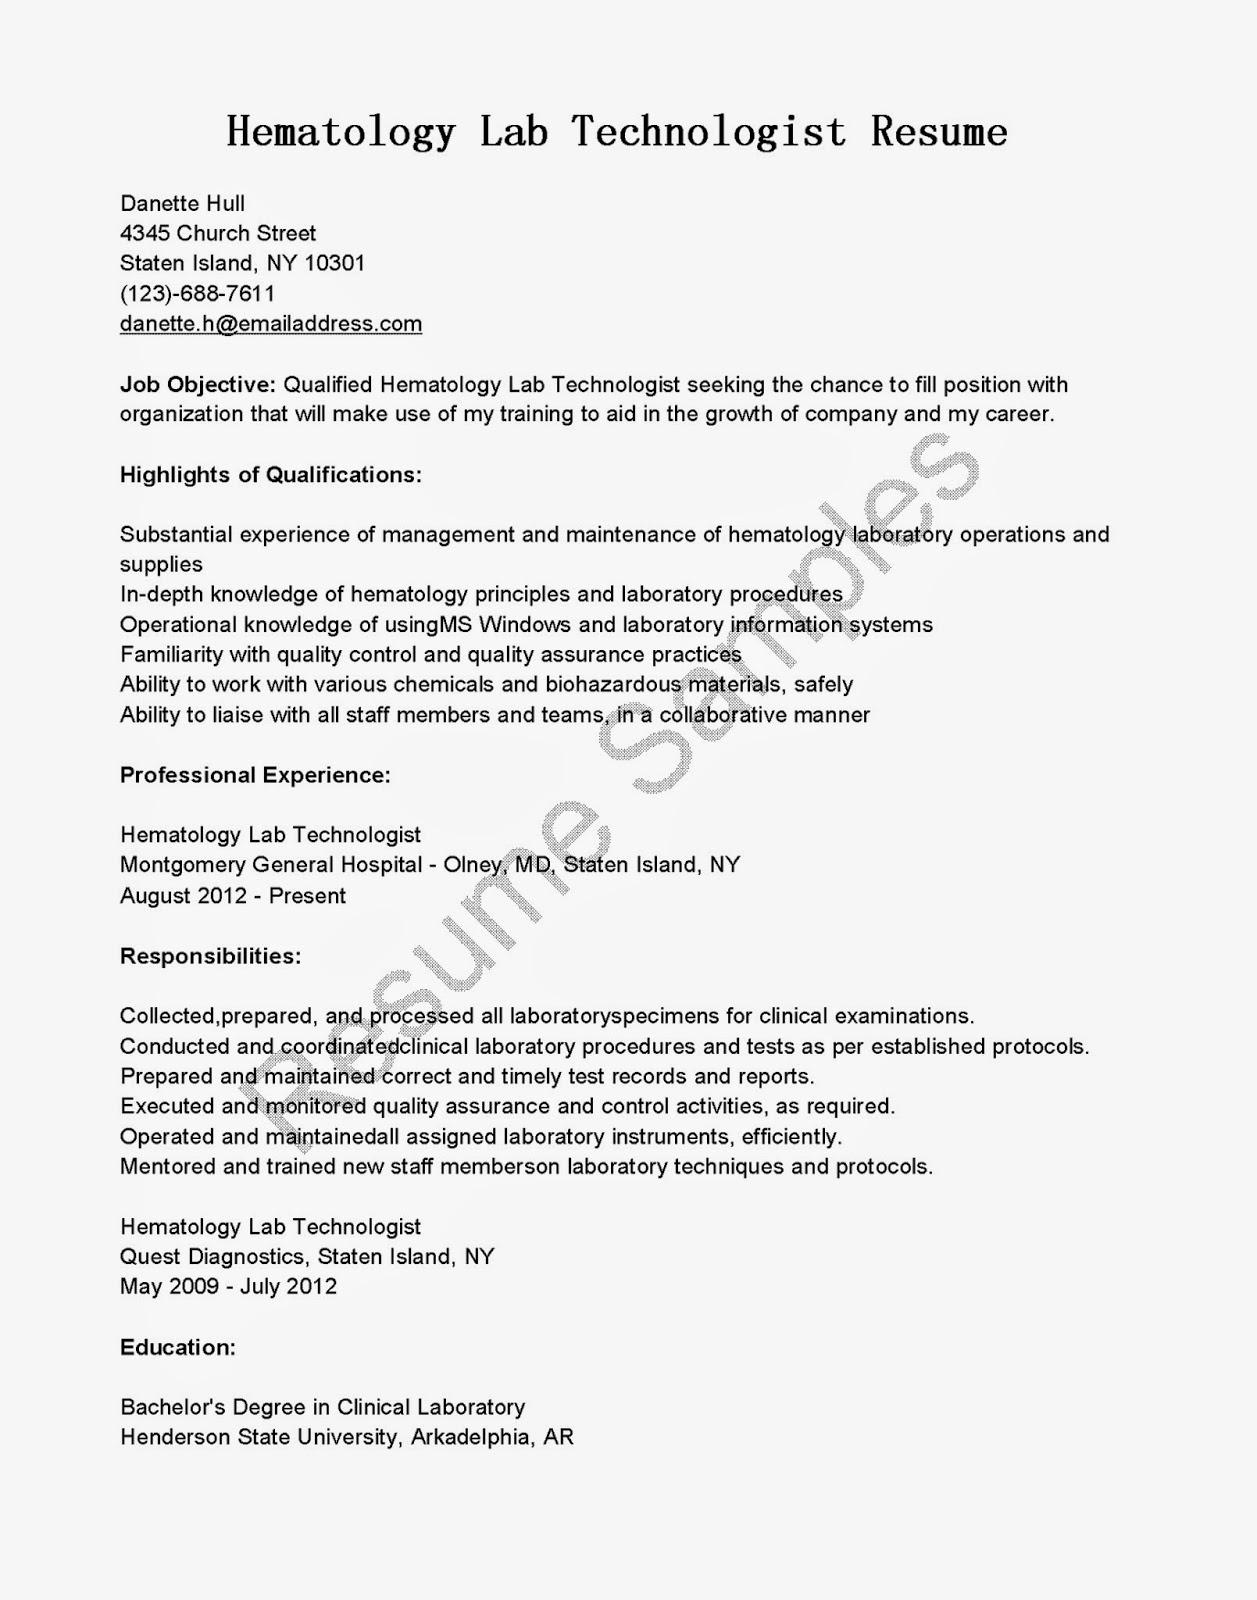 stanford mba resume book pdf interesting resume templates